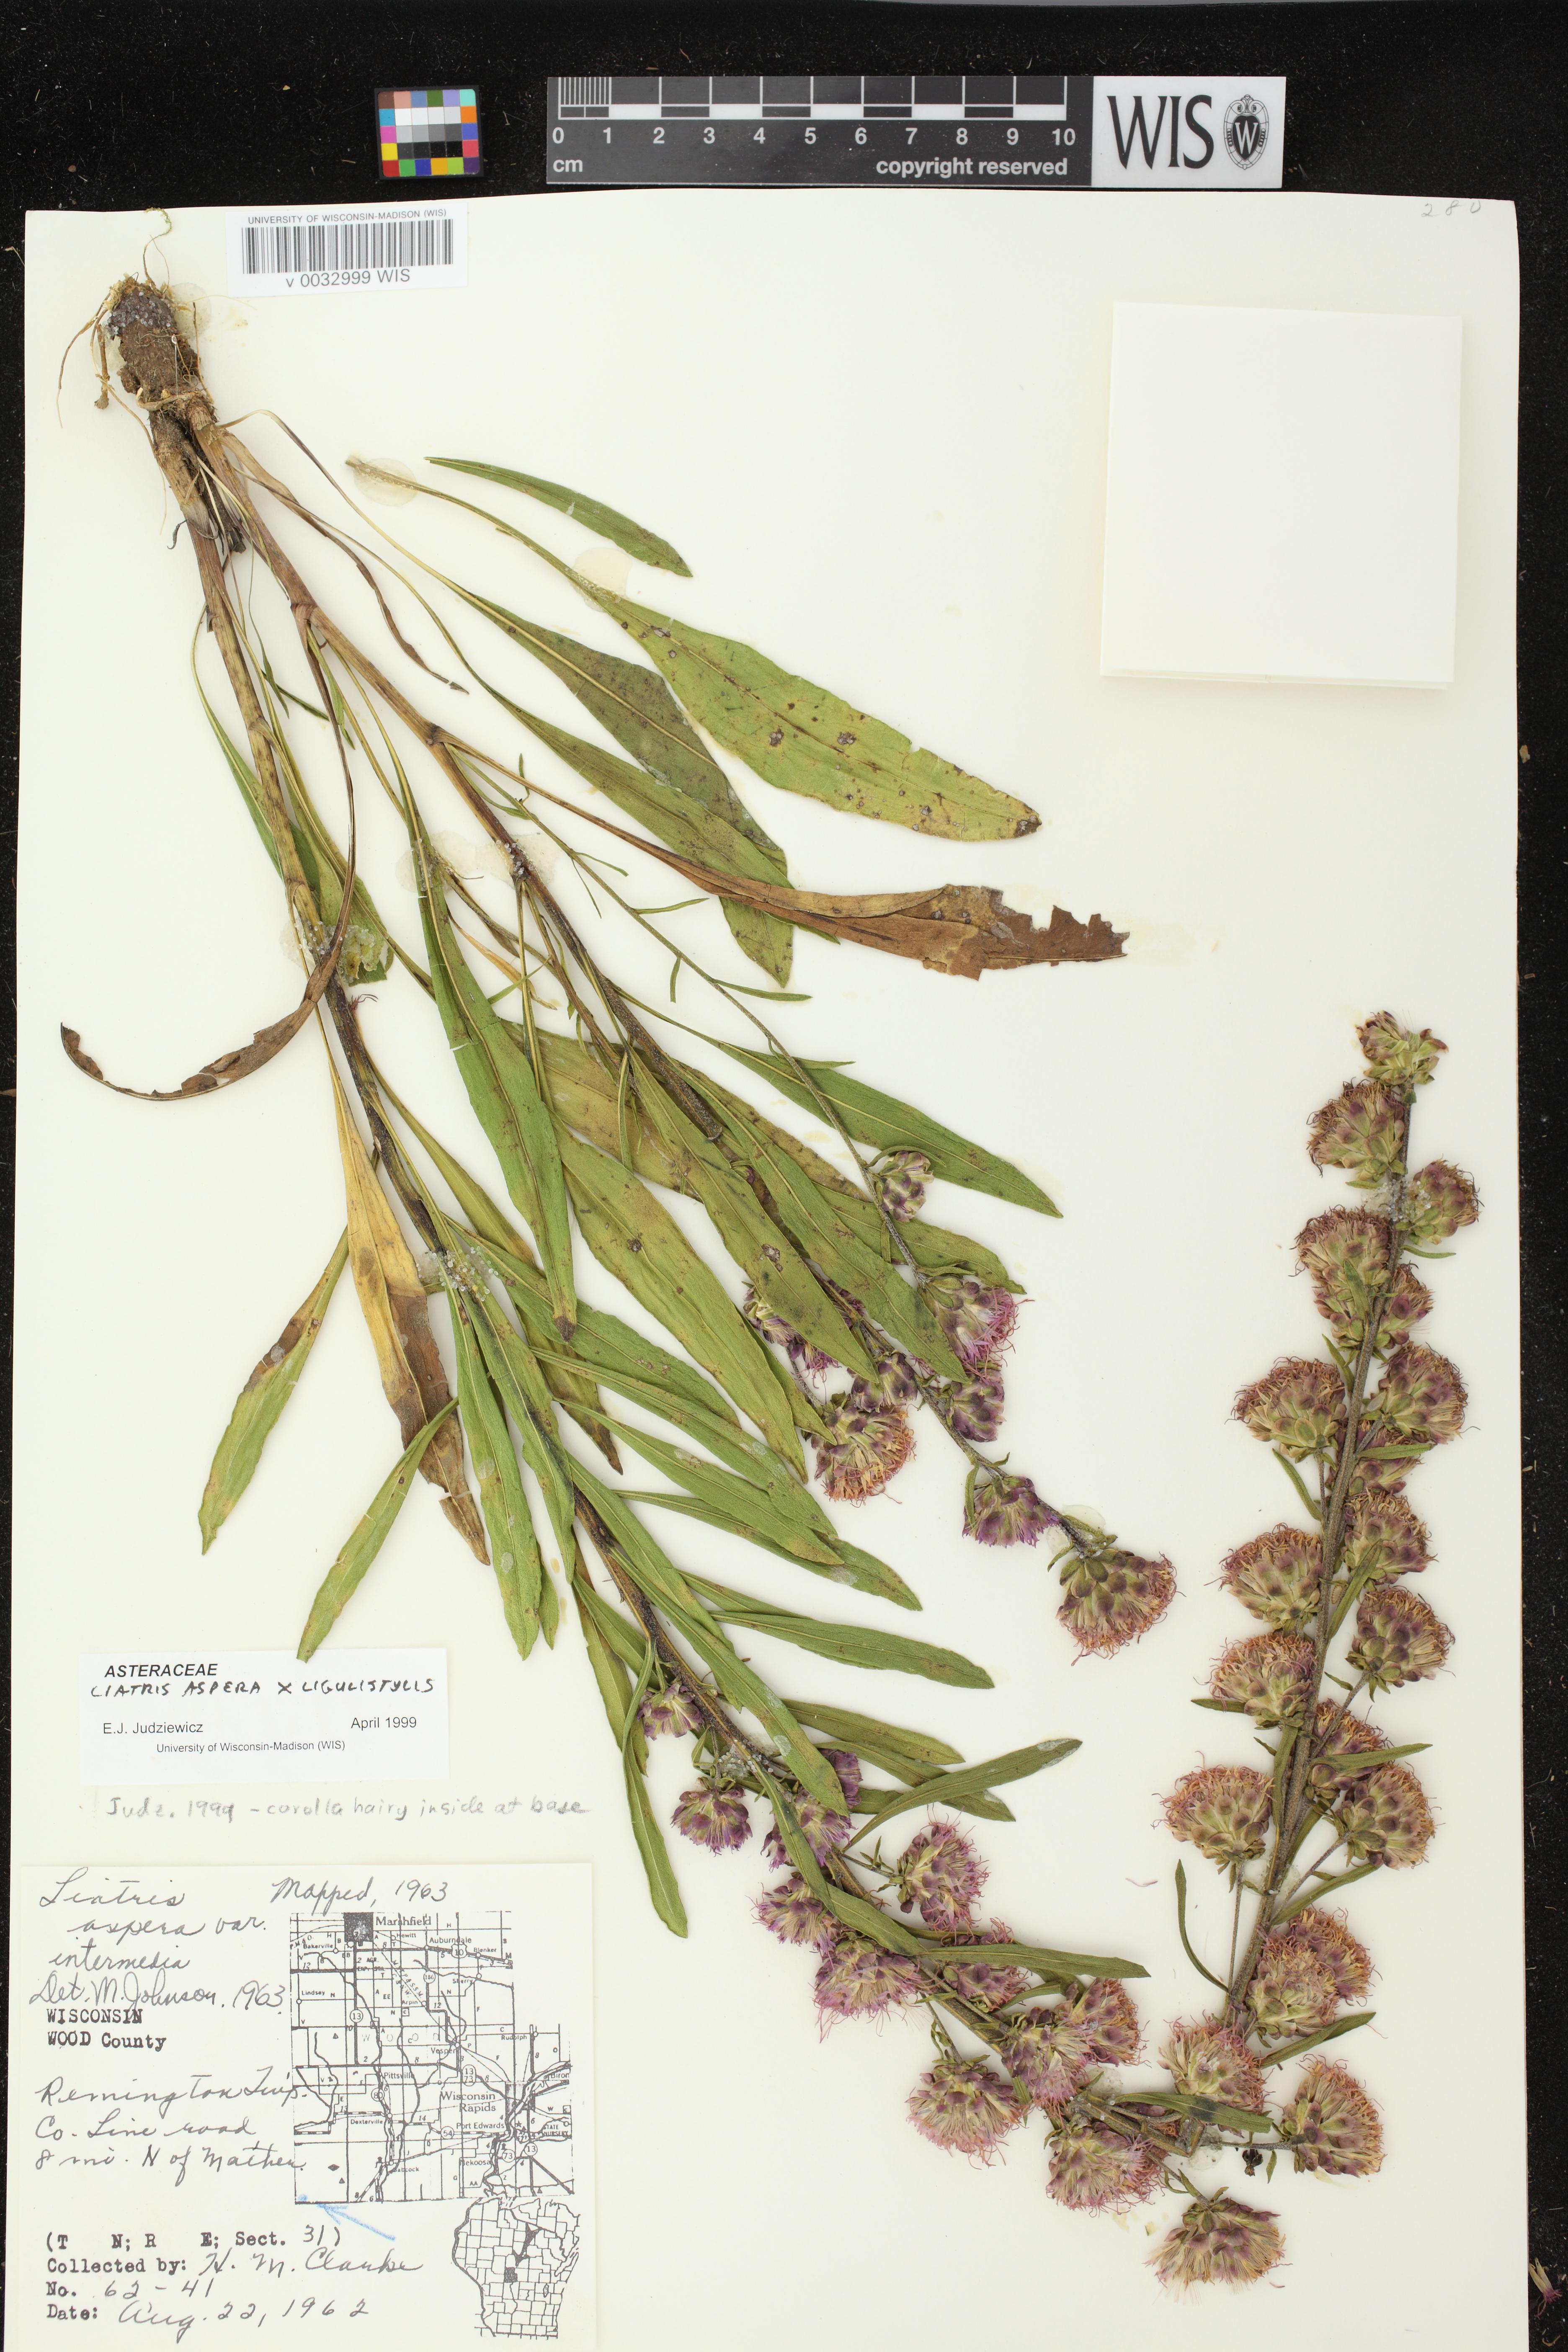 Image of Liatris aspera x l. ligulistylis